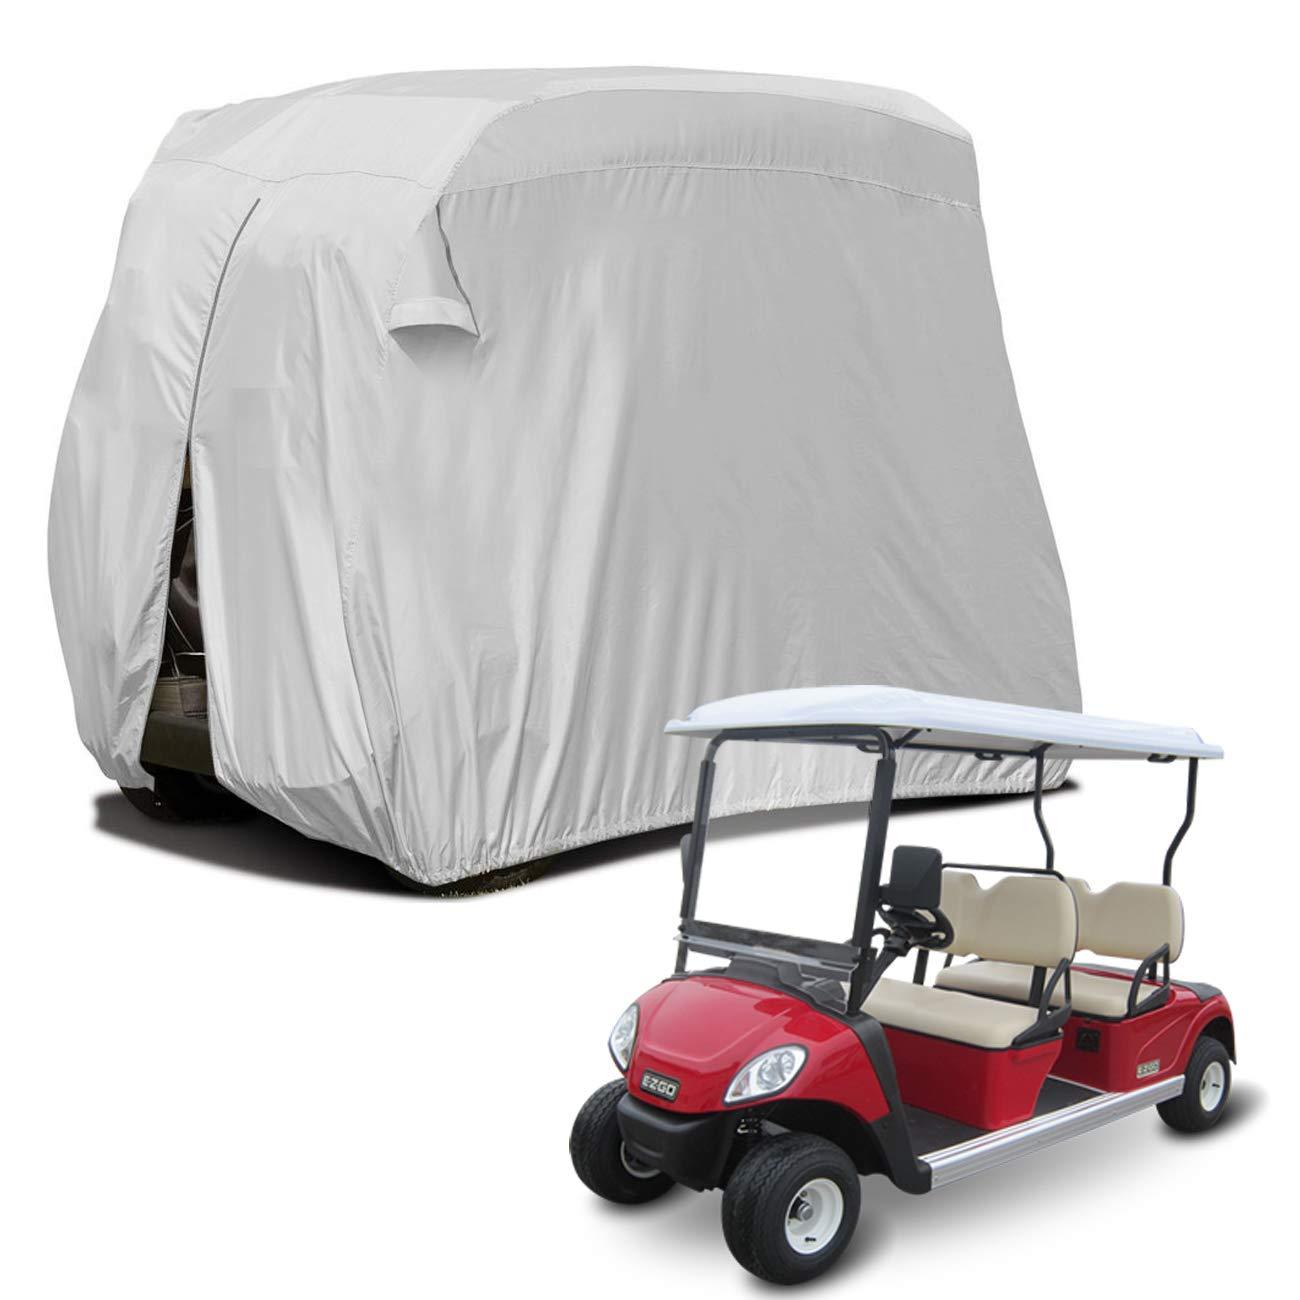 Sunnyglade 4 Passenger Waterproof Golf Cart Cover Roof 80'' L, Fits EZ GO, Club Car Yamaha, Dustproof Durable (Silver)